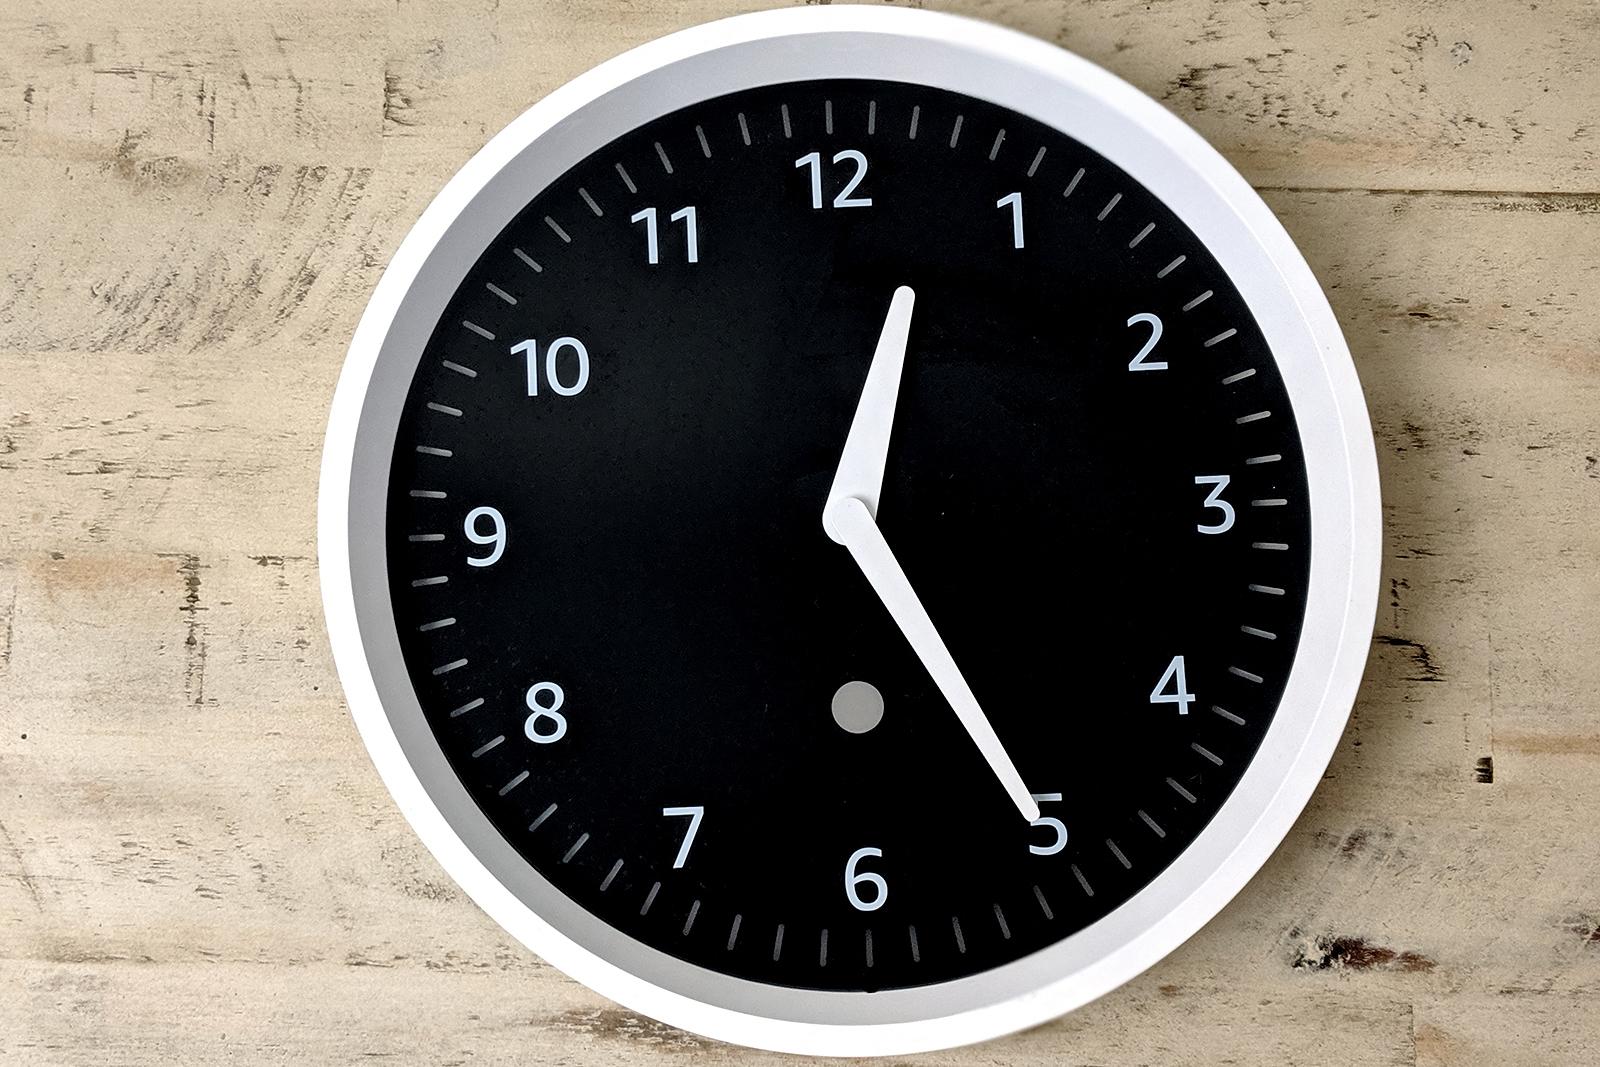 148766-smart-home-review-echo-wall-clock-image1-yhik6caxgz.jpg